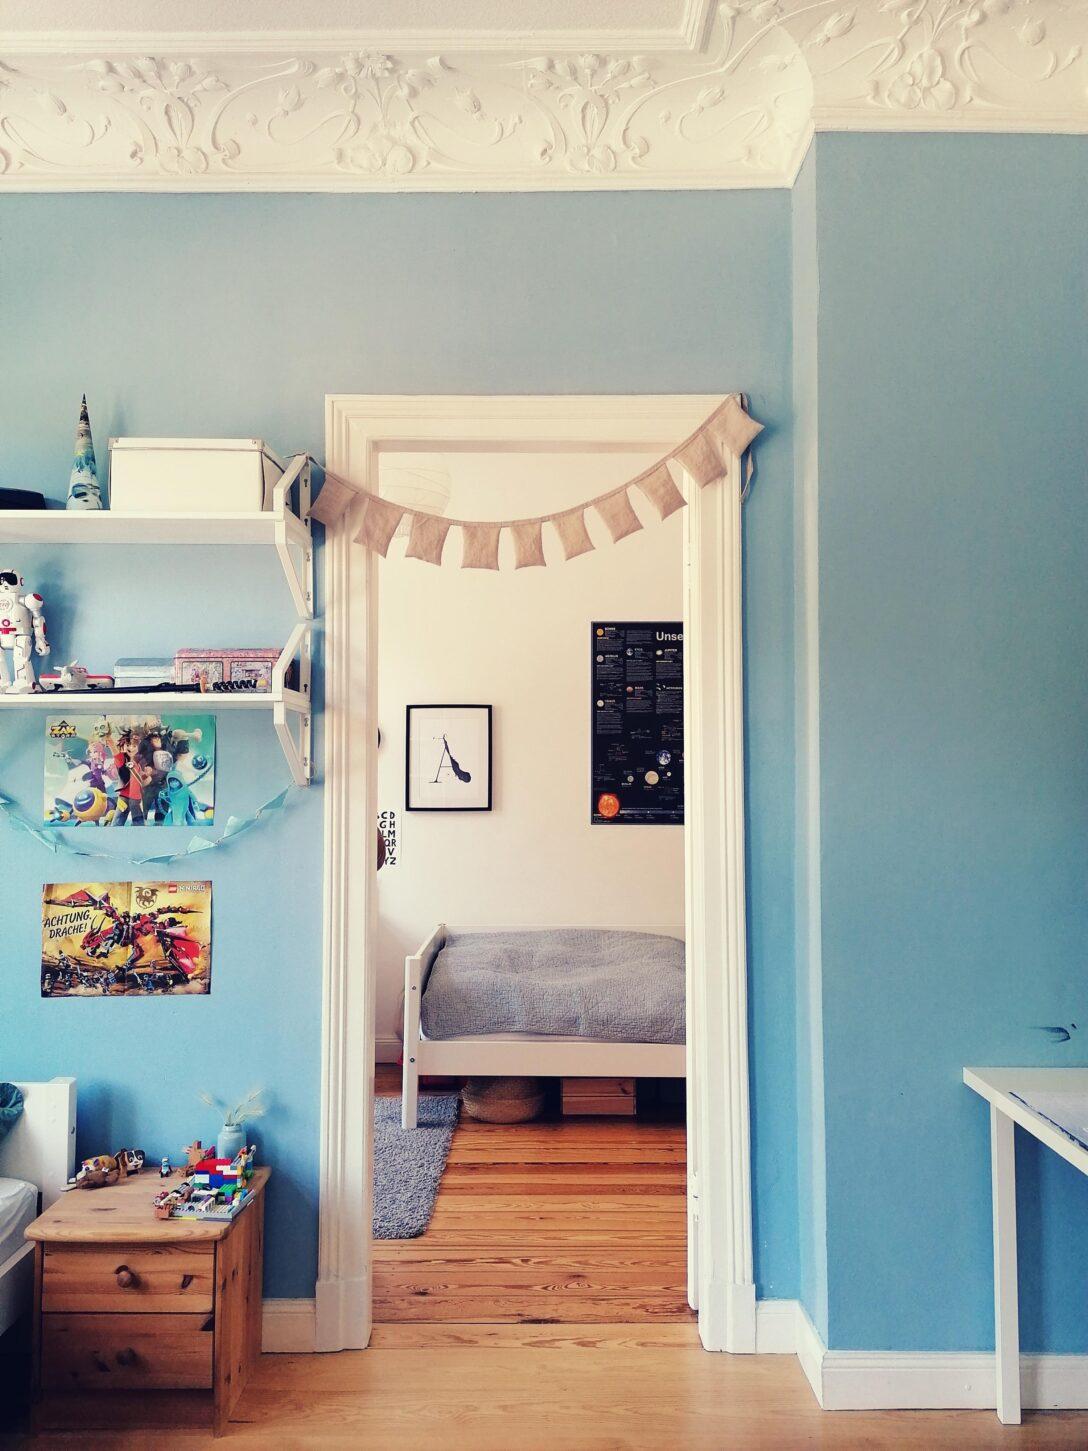 Large Size of Raumteiler Kinderzimmer Durchgangszimmer Bilder Ideen Couch Regal Weiß Sofa Regale Kinderzimmer Raumteiler Kinderzimmer